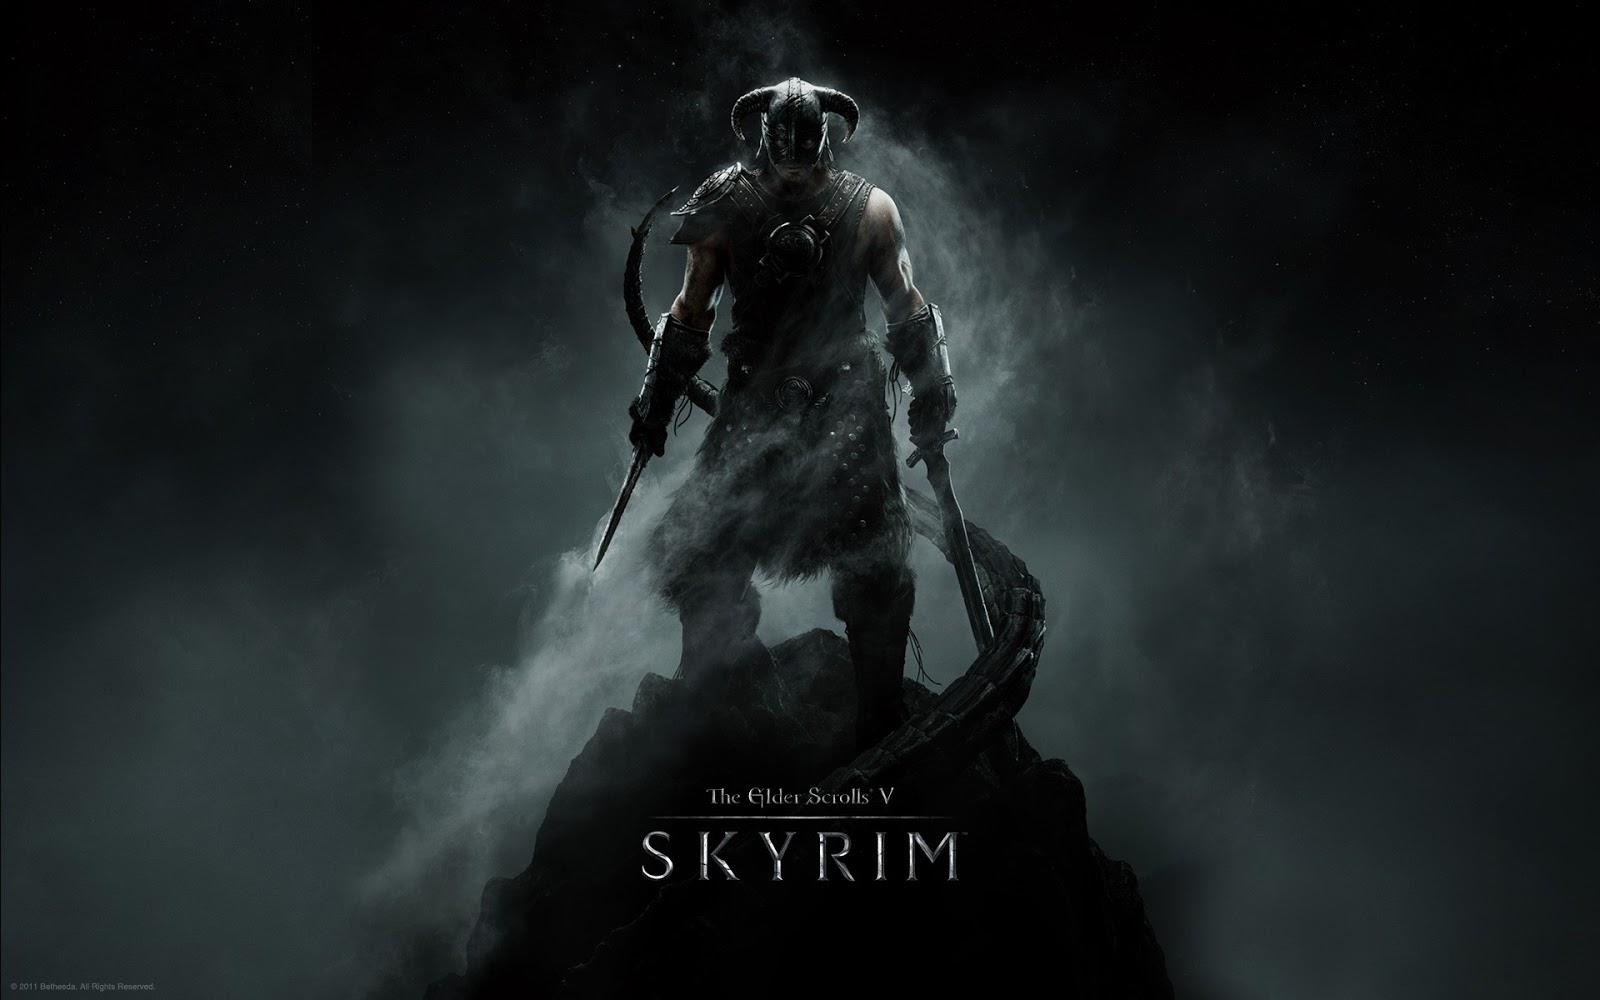 The D-Pad: Skyrim